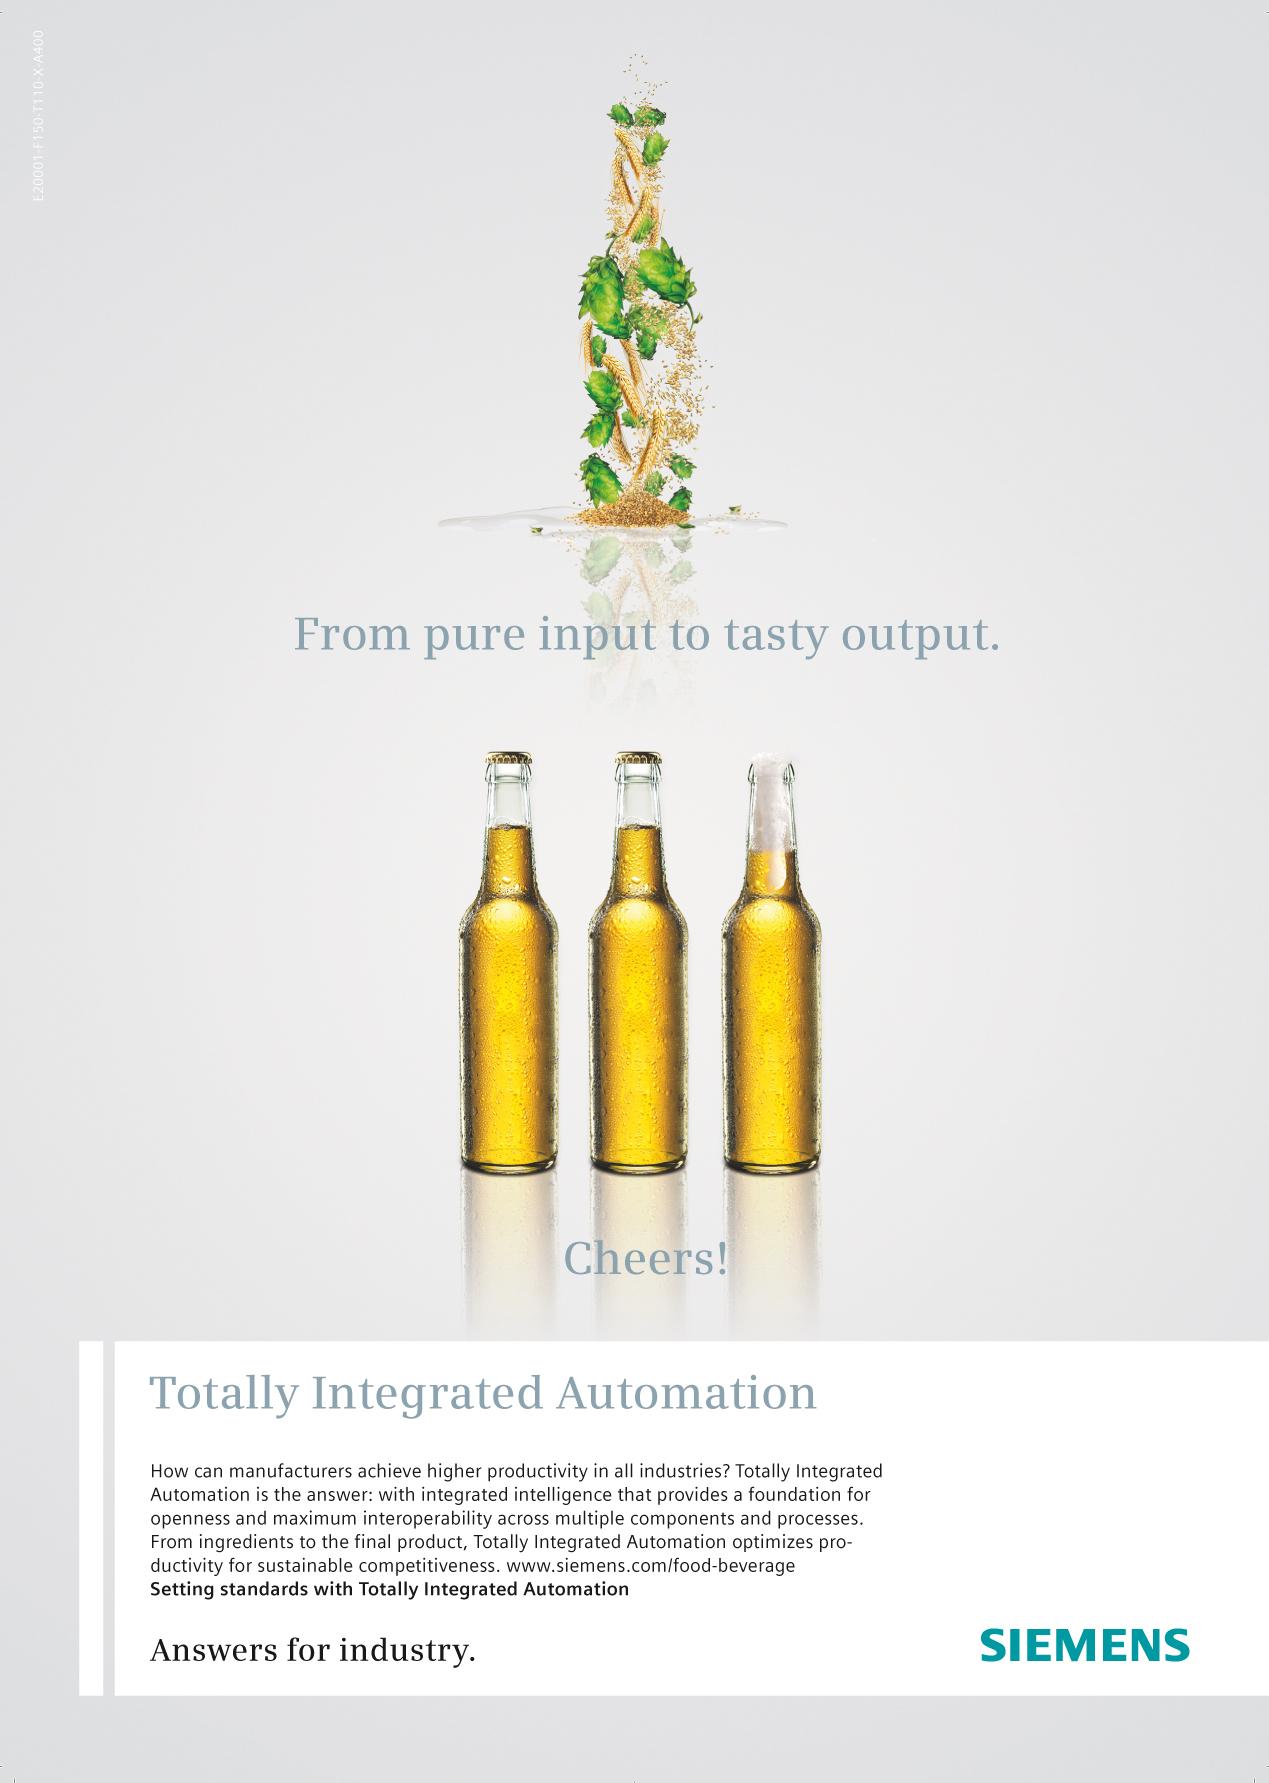 Corporate Ad Design Ad Campaign By David J Johnson At